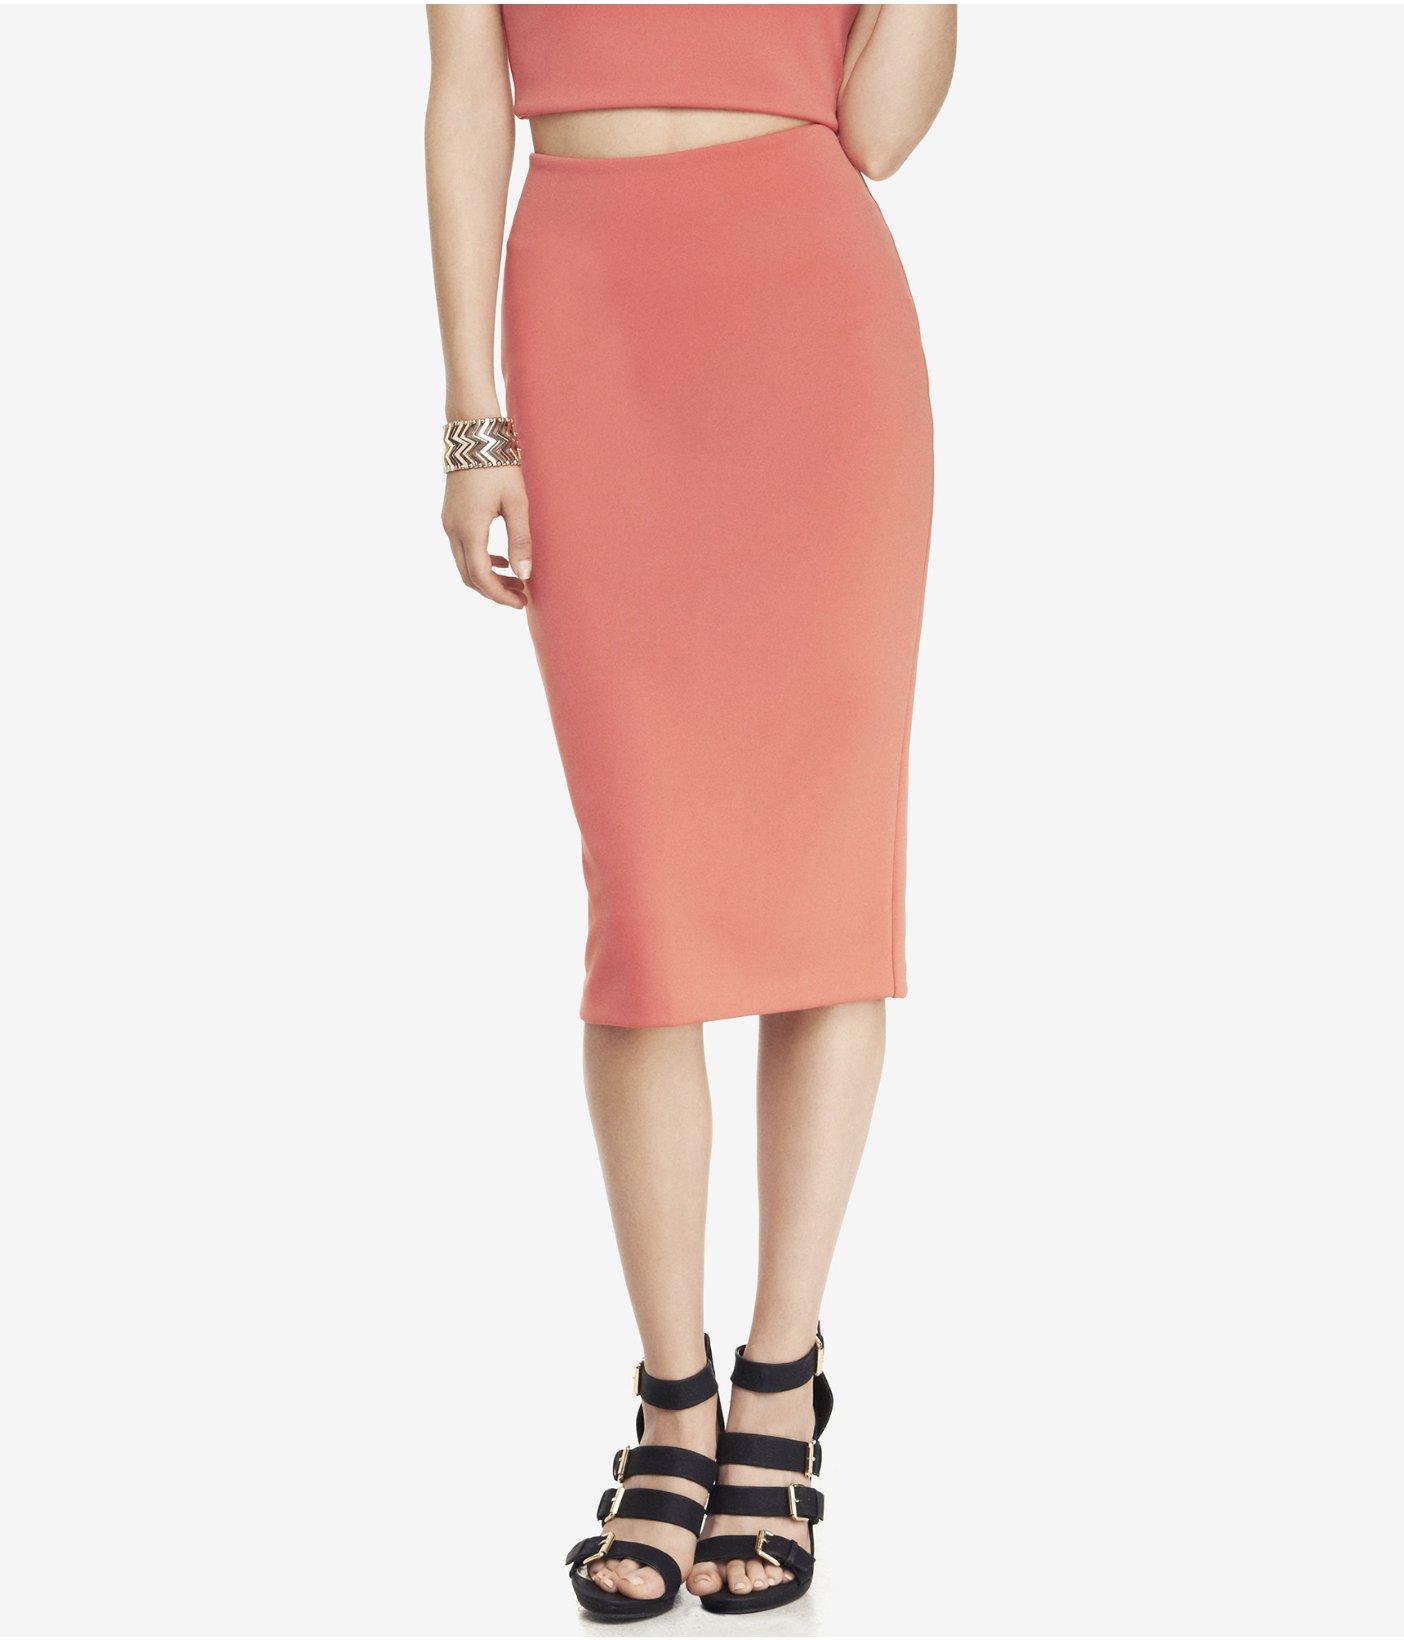 Express Coral High Waist Midi Pencil Skirt in Orange | Lyst